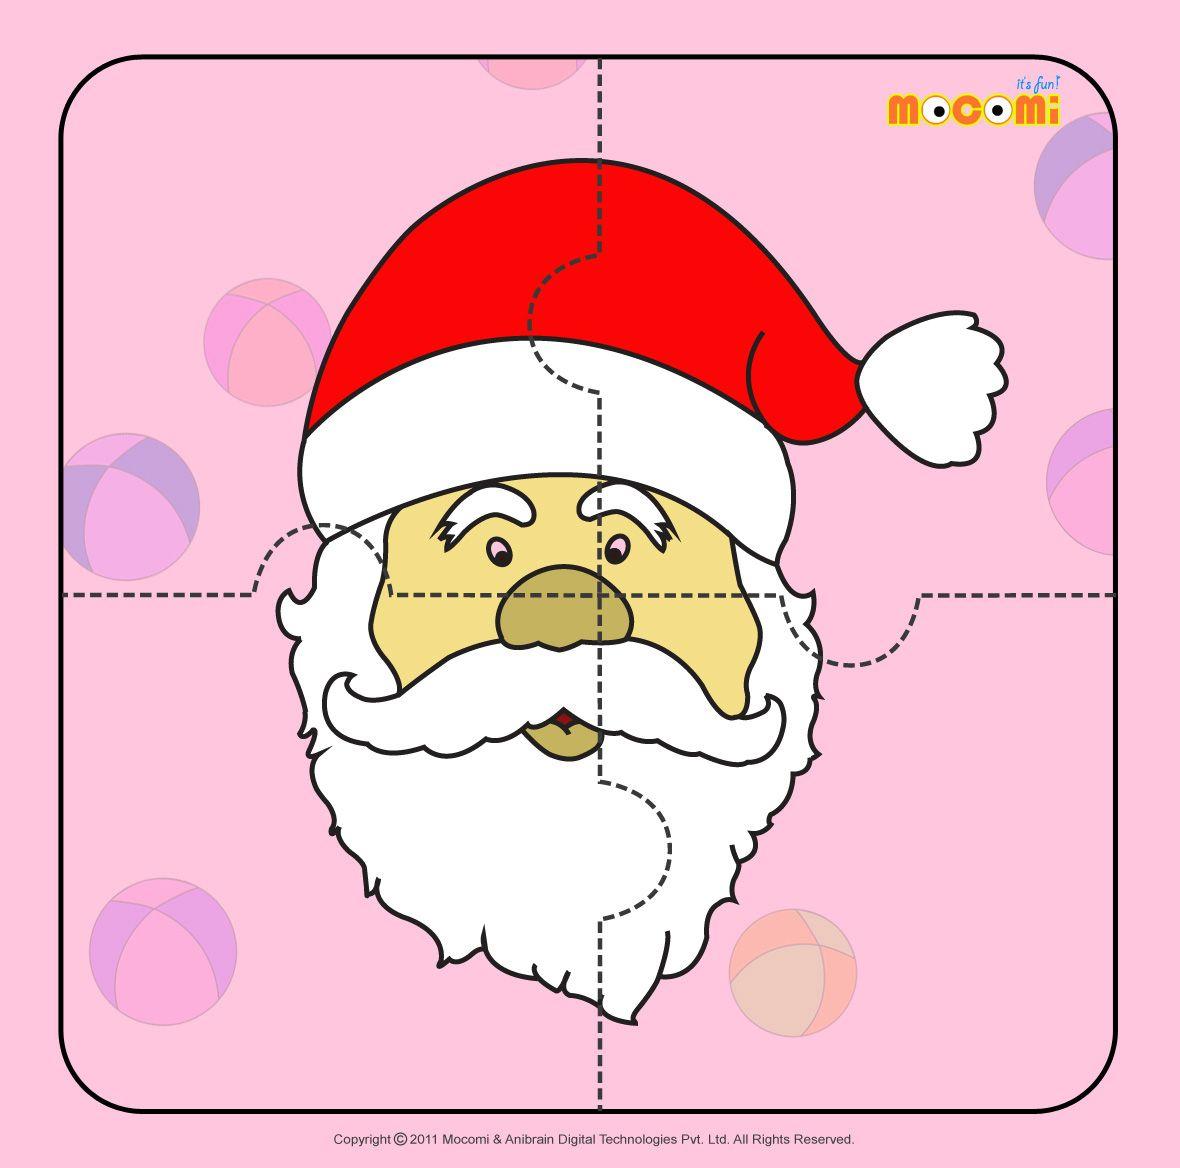 Santa Claus 2 - Jigzaw Puzzles For Kids | Printables For Kids - Printable Jigsaw Puzzle For Toddlers